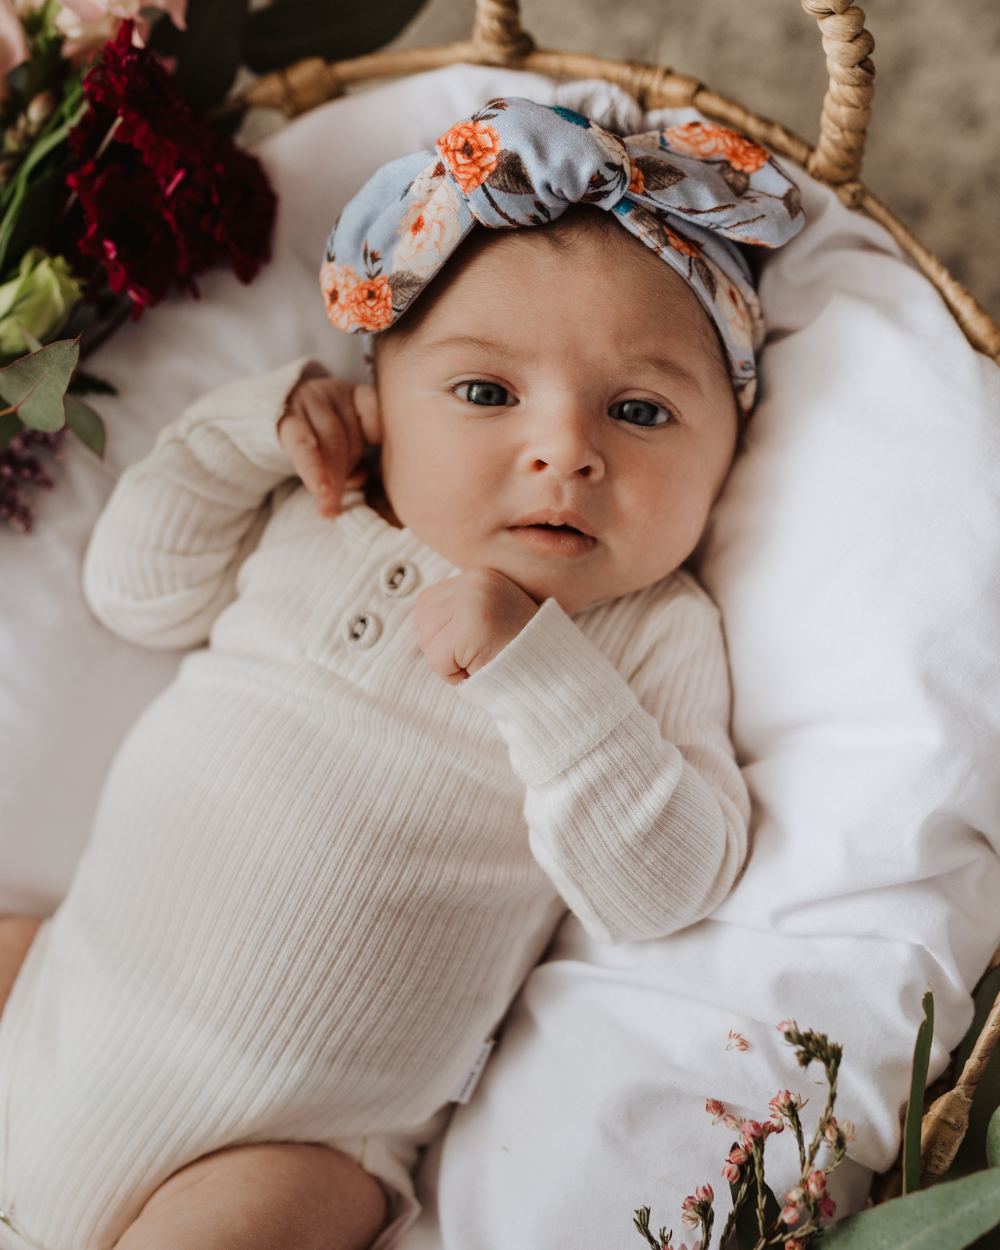 Vintage Blossom Topknot Baby Headband   Snuggle Hunny Kids